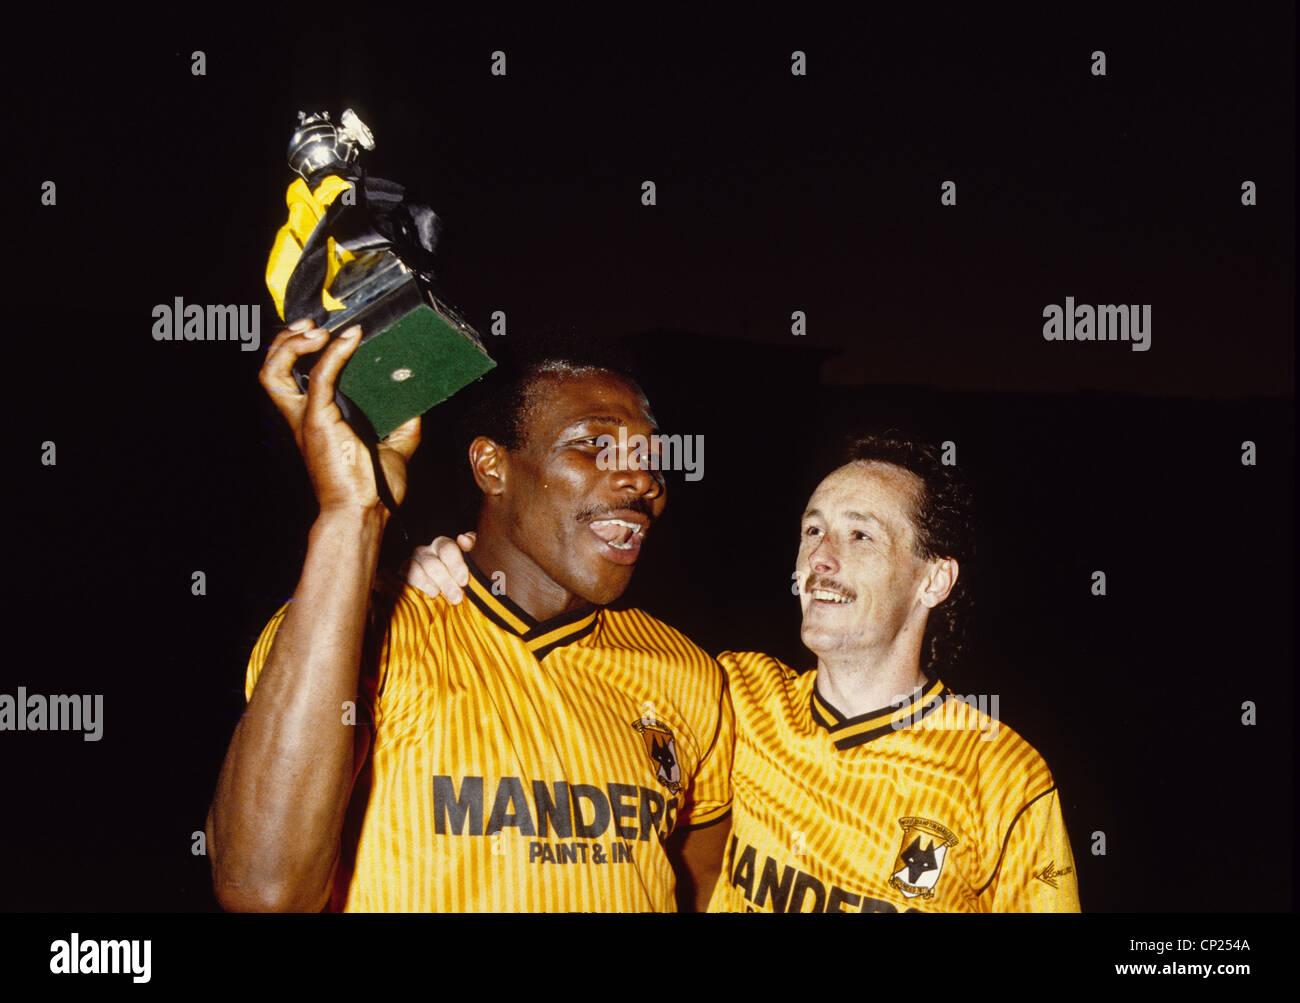 Wolverhampton Wanderers footballers Floyd Streete and Nigel Vaughan celebrate winning 3rd Division Championship - Stock Image